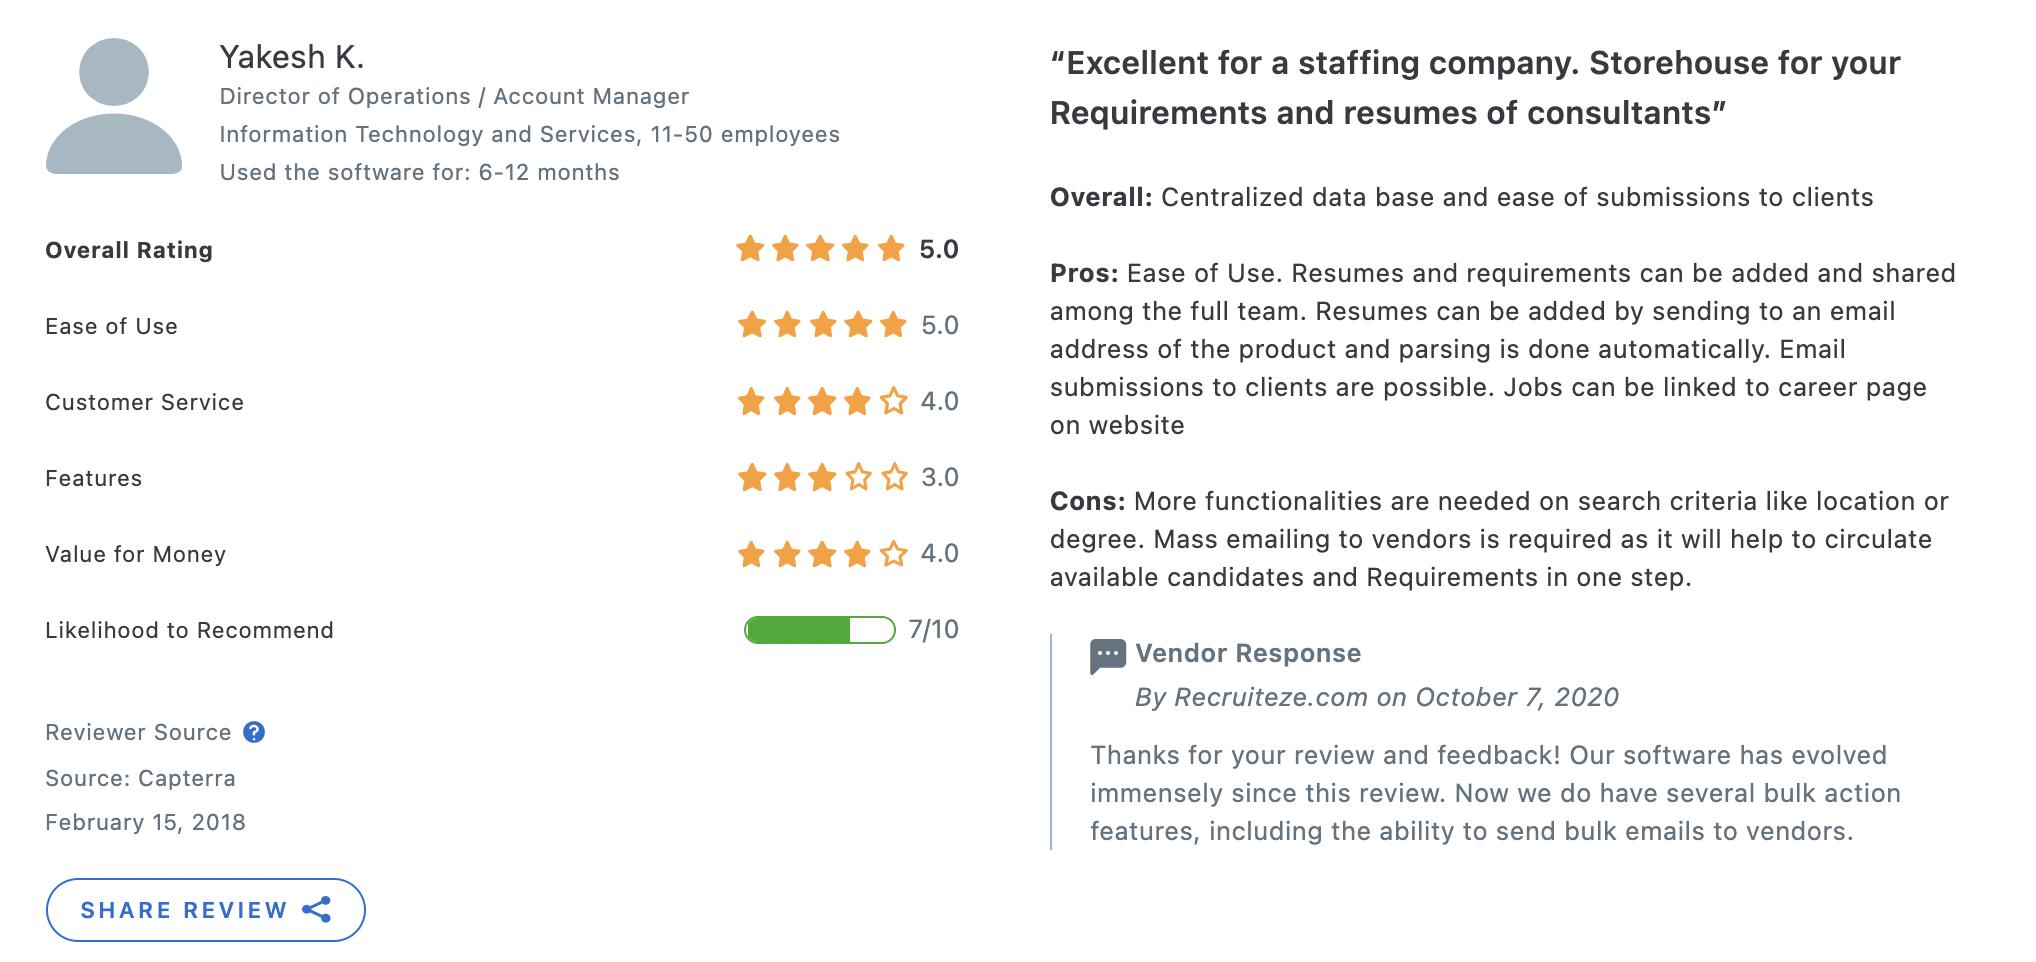 Recruiteze reviews